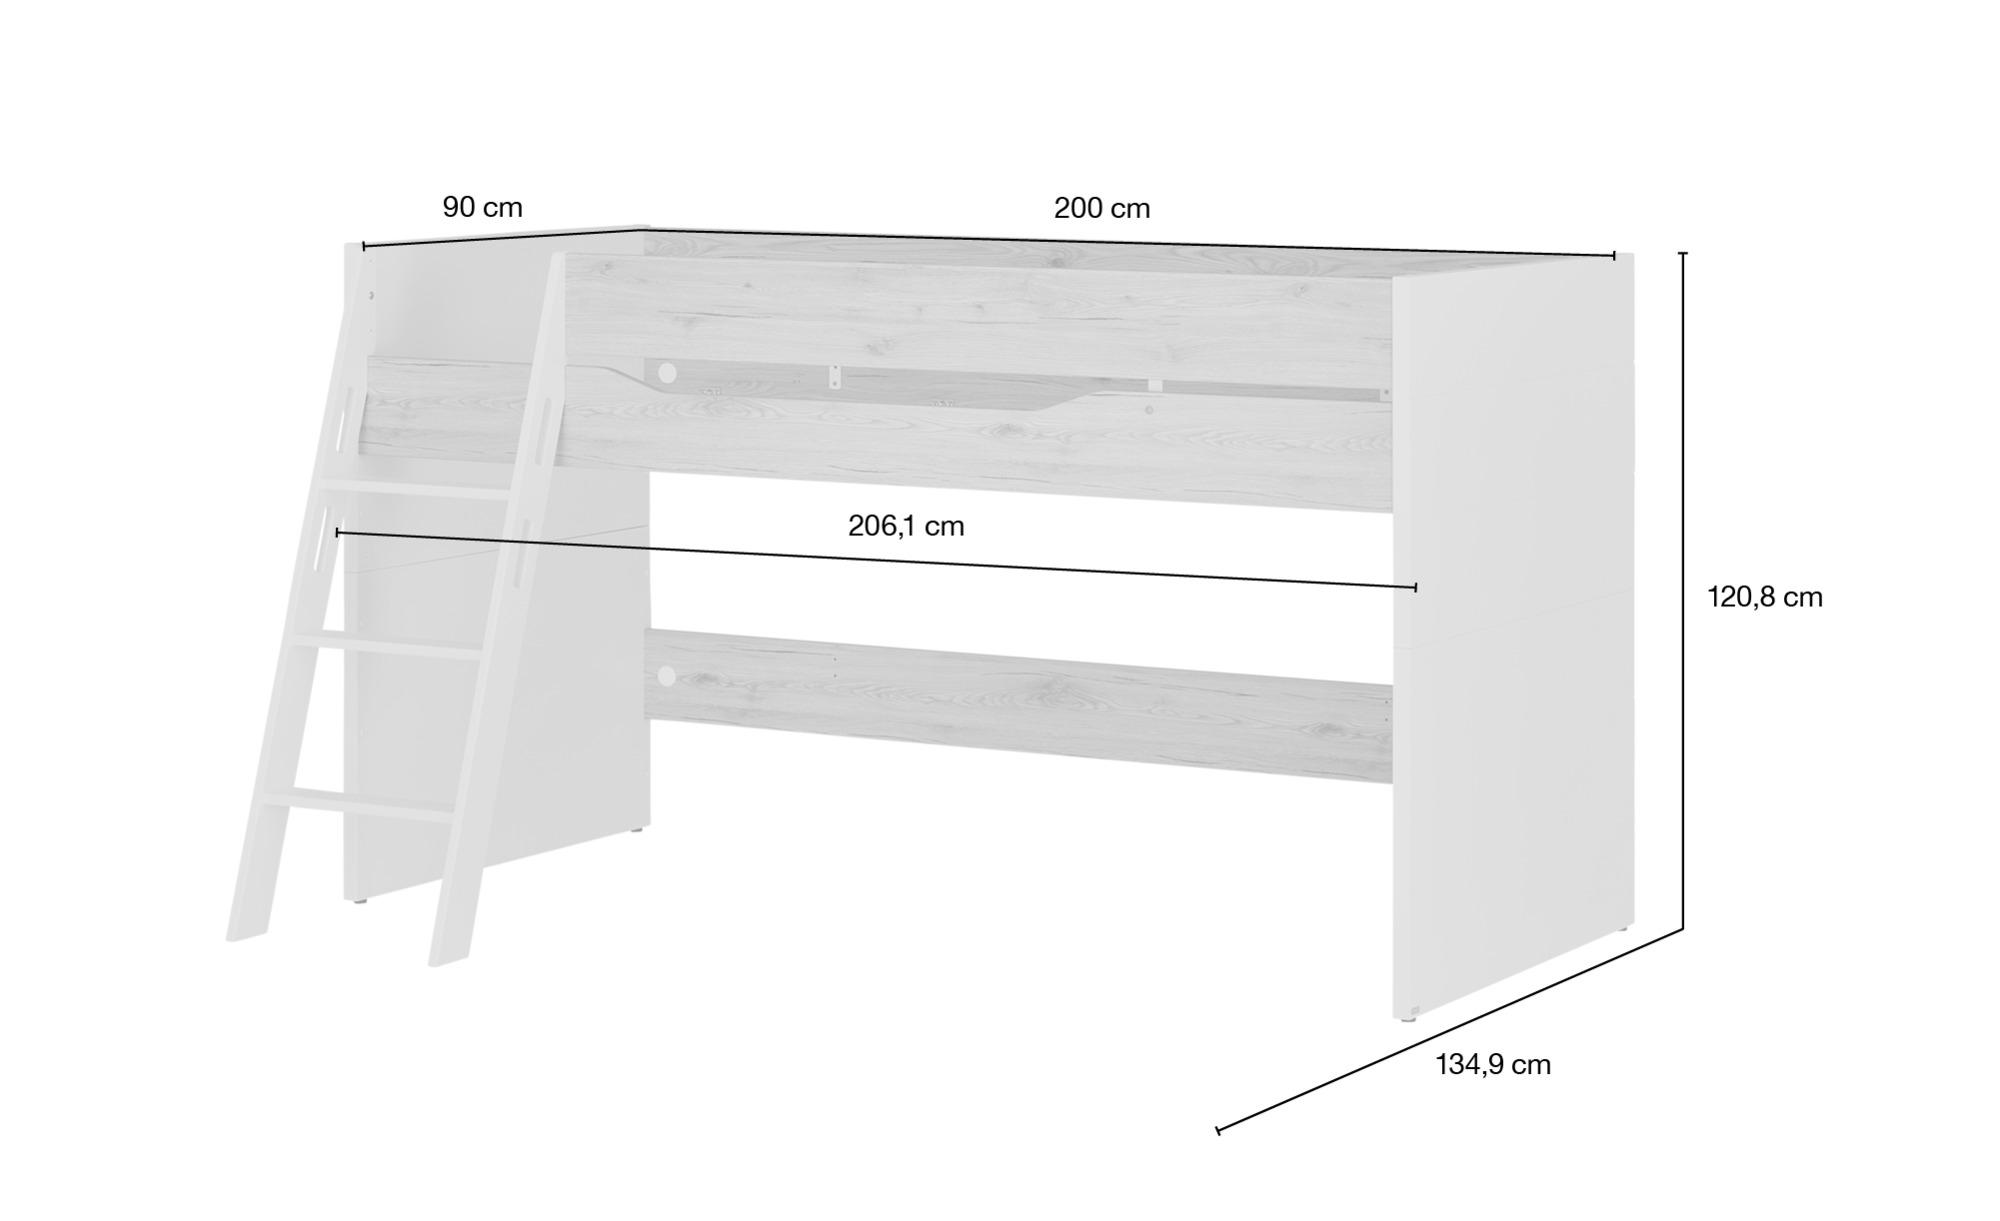 paidi spielbett fionn 90x200 cm 134 4 cm h ffner. Black Bedroom Furniture Sets. Home Design Ideas